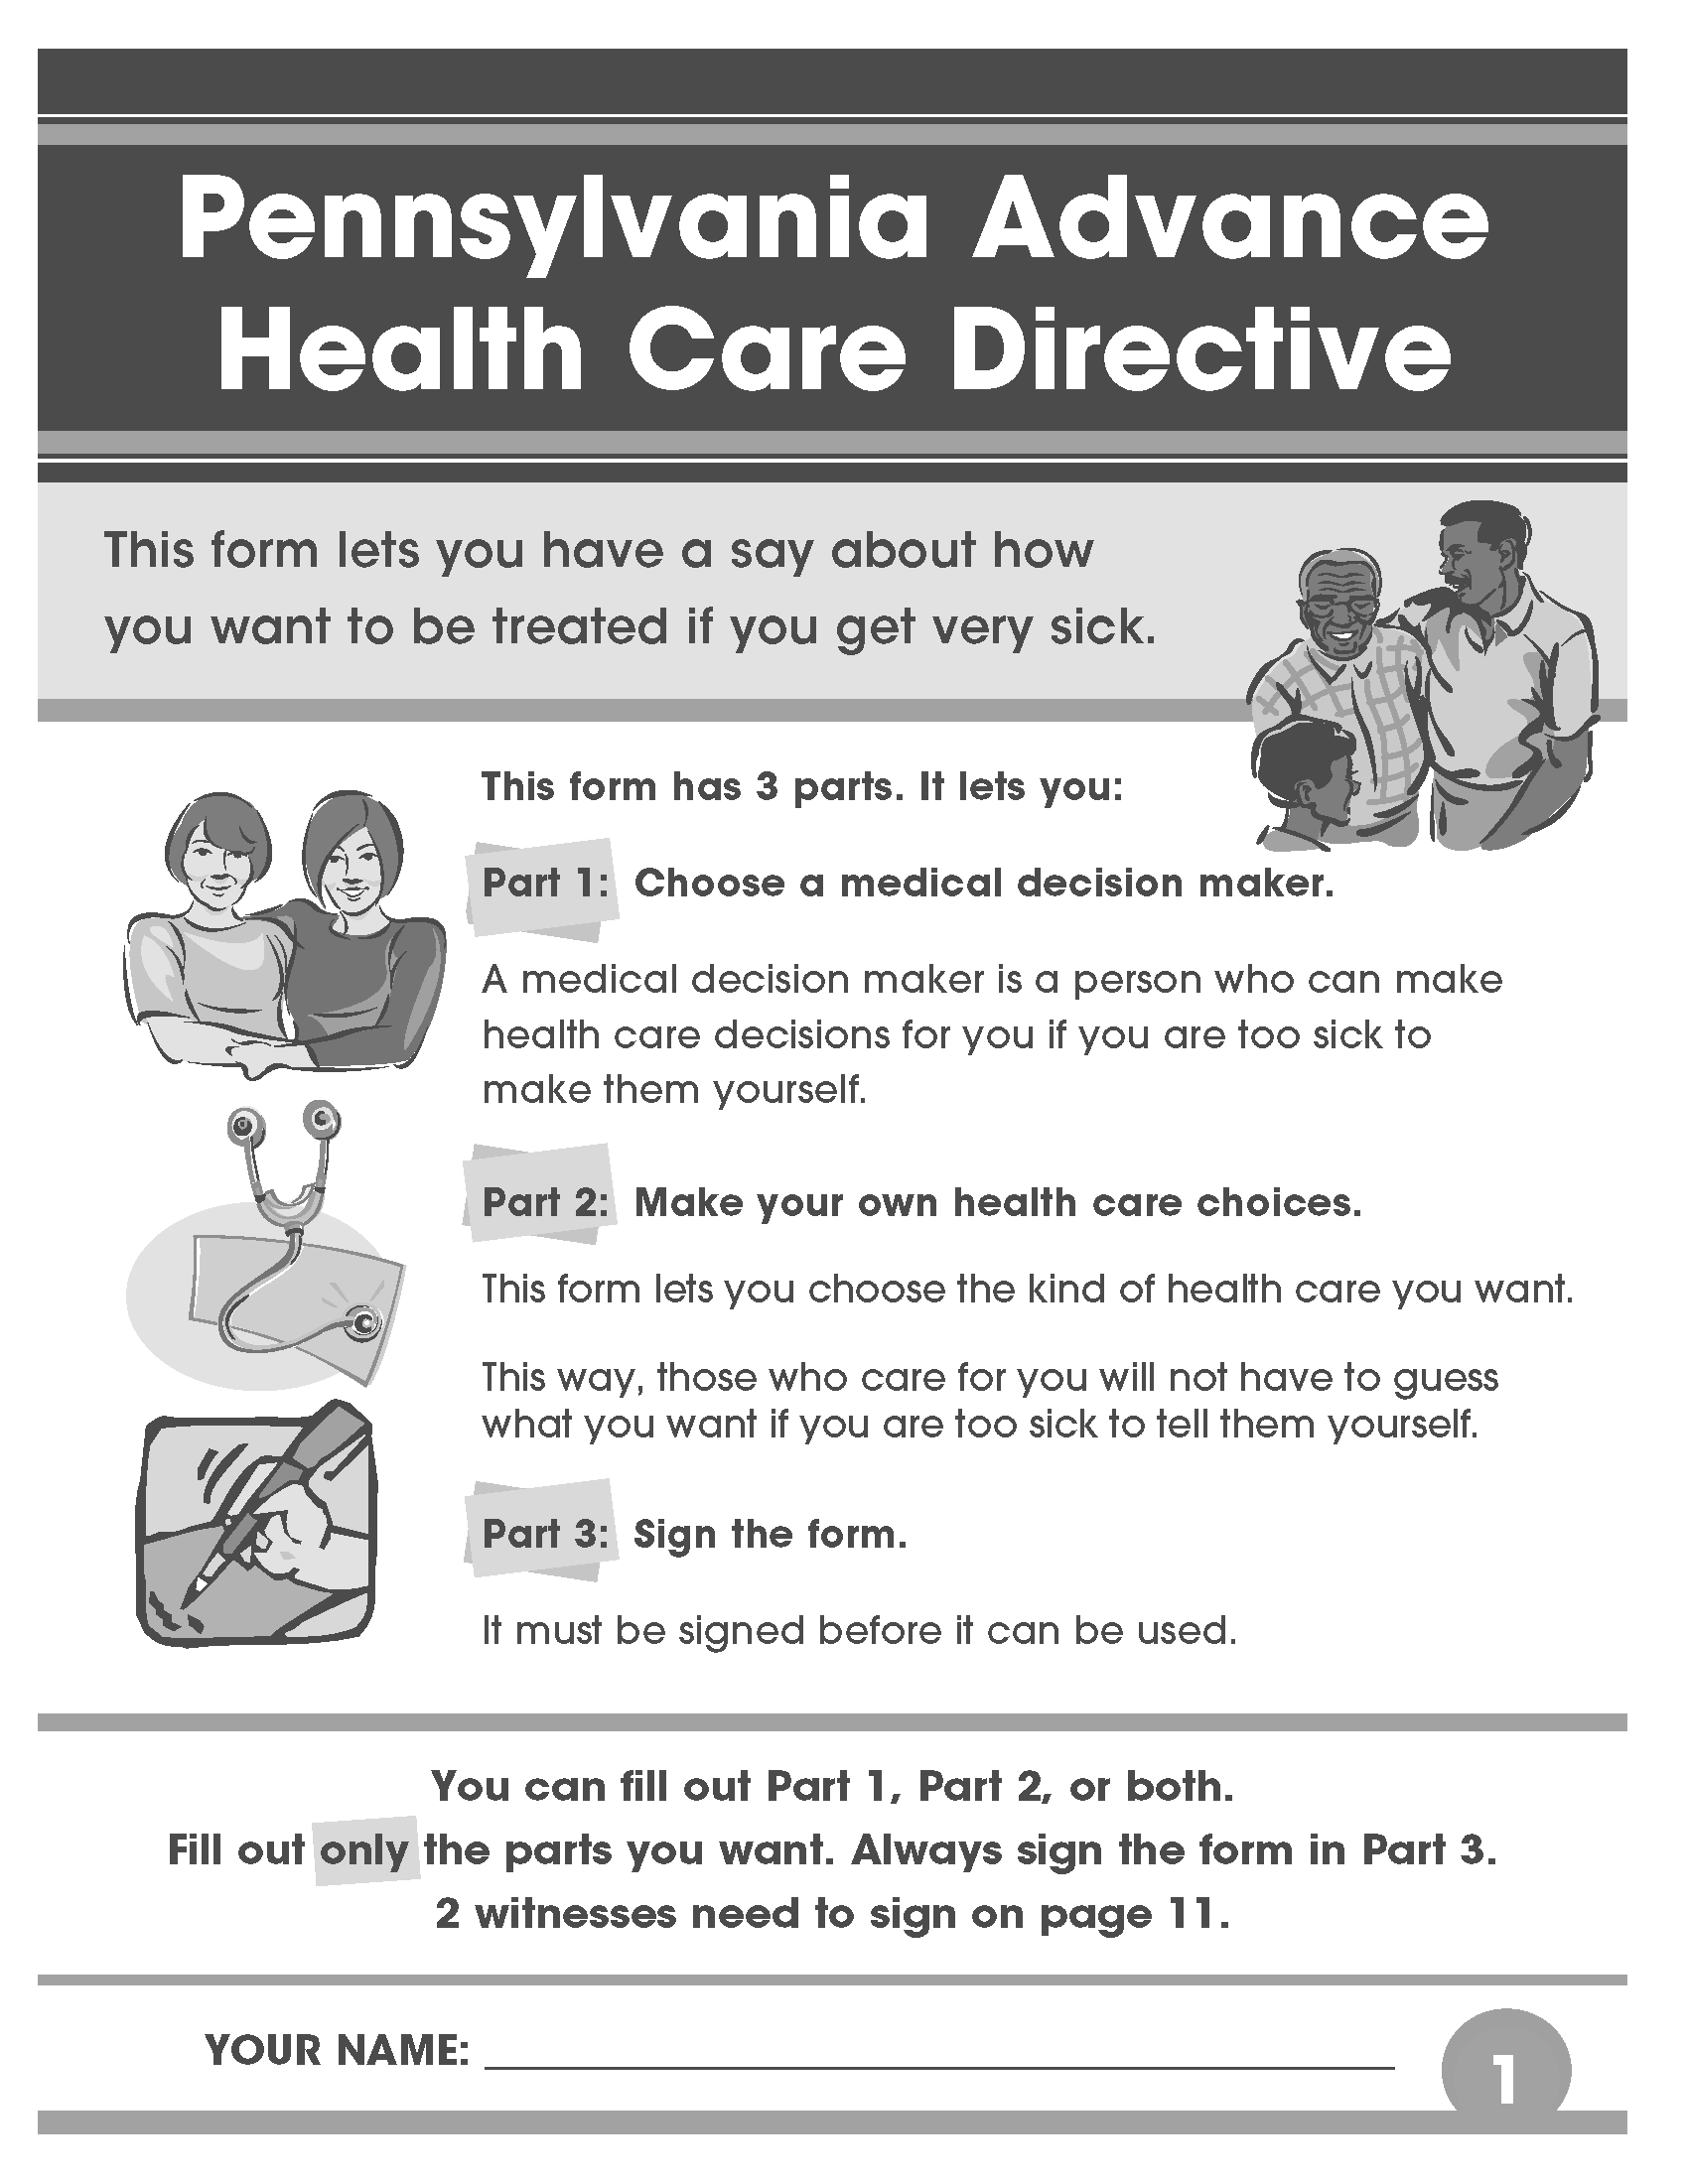 Pennsylvania Advance Directive For Health Care